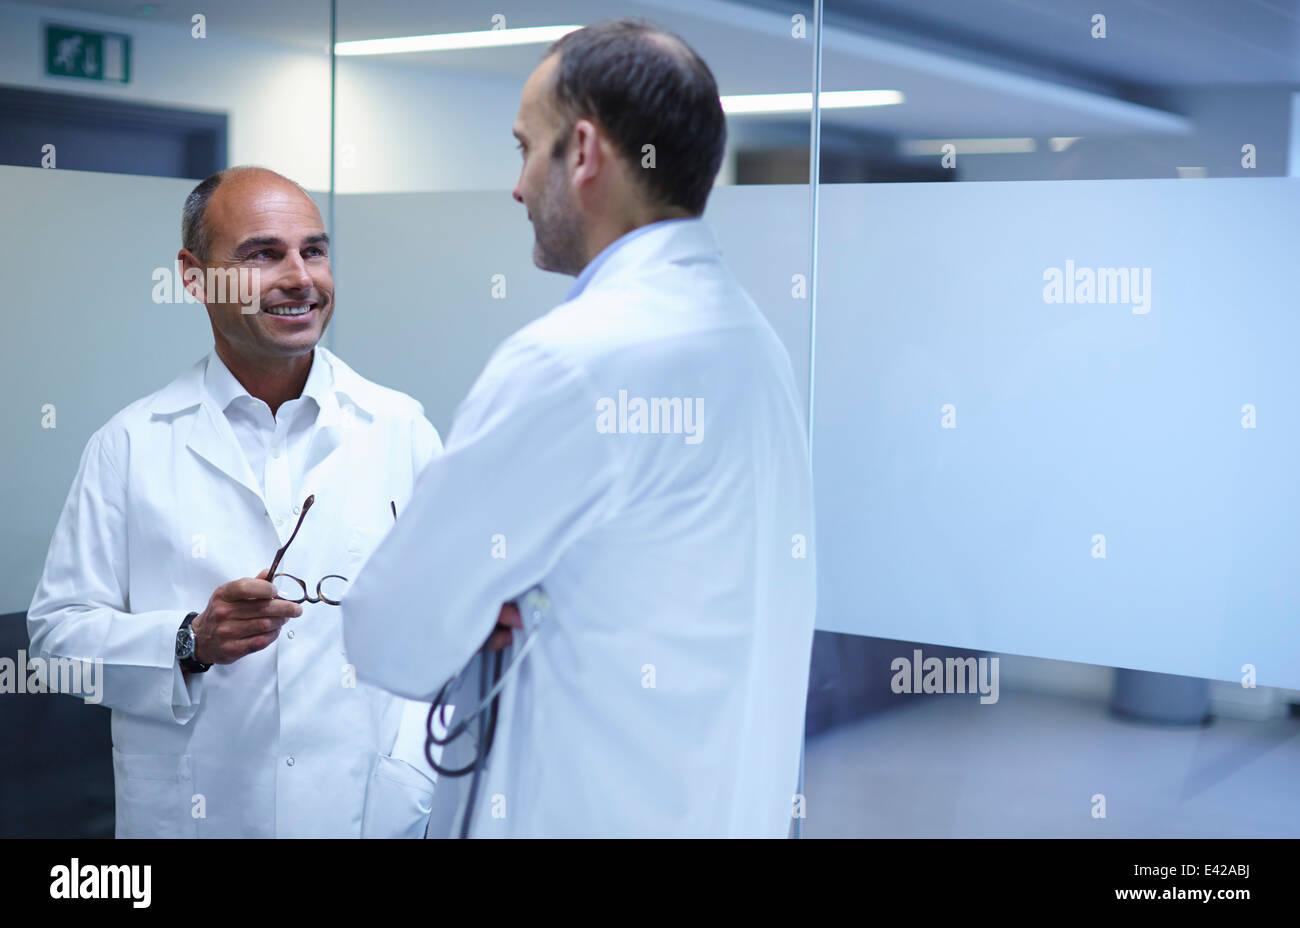 Doctors taking break in office - Stock Image